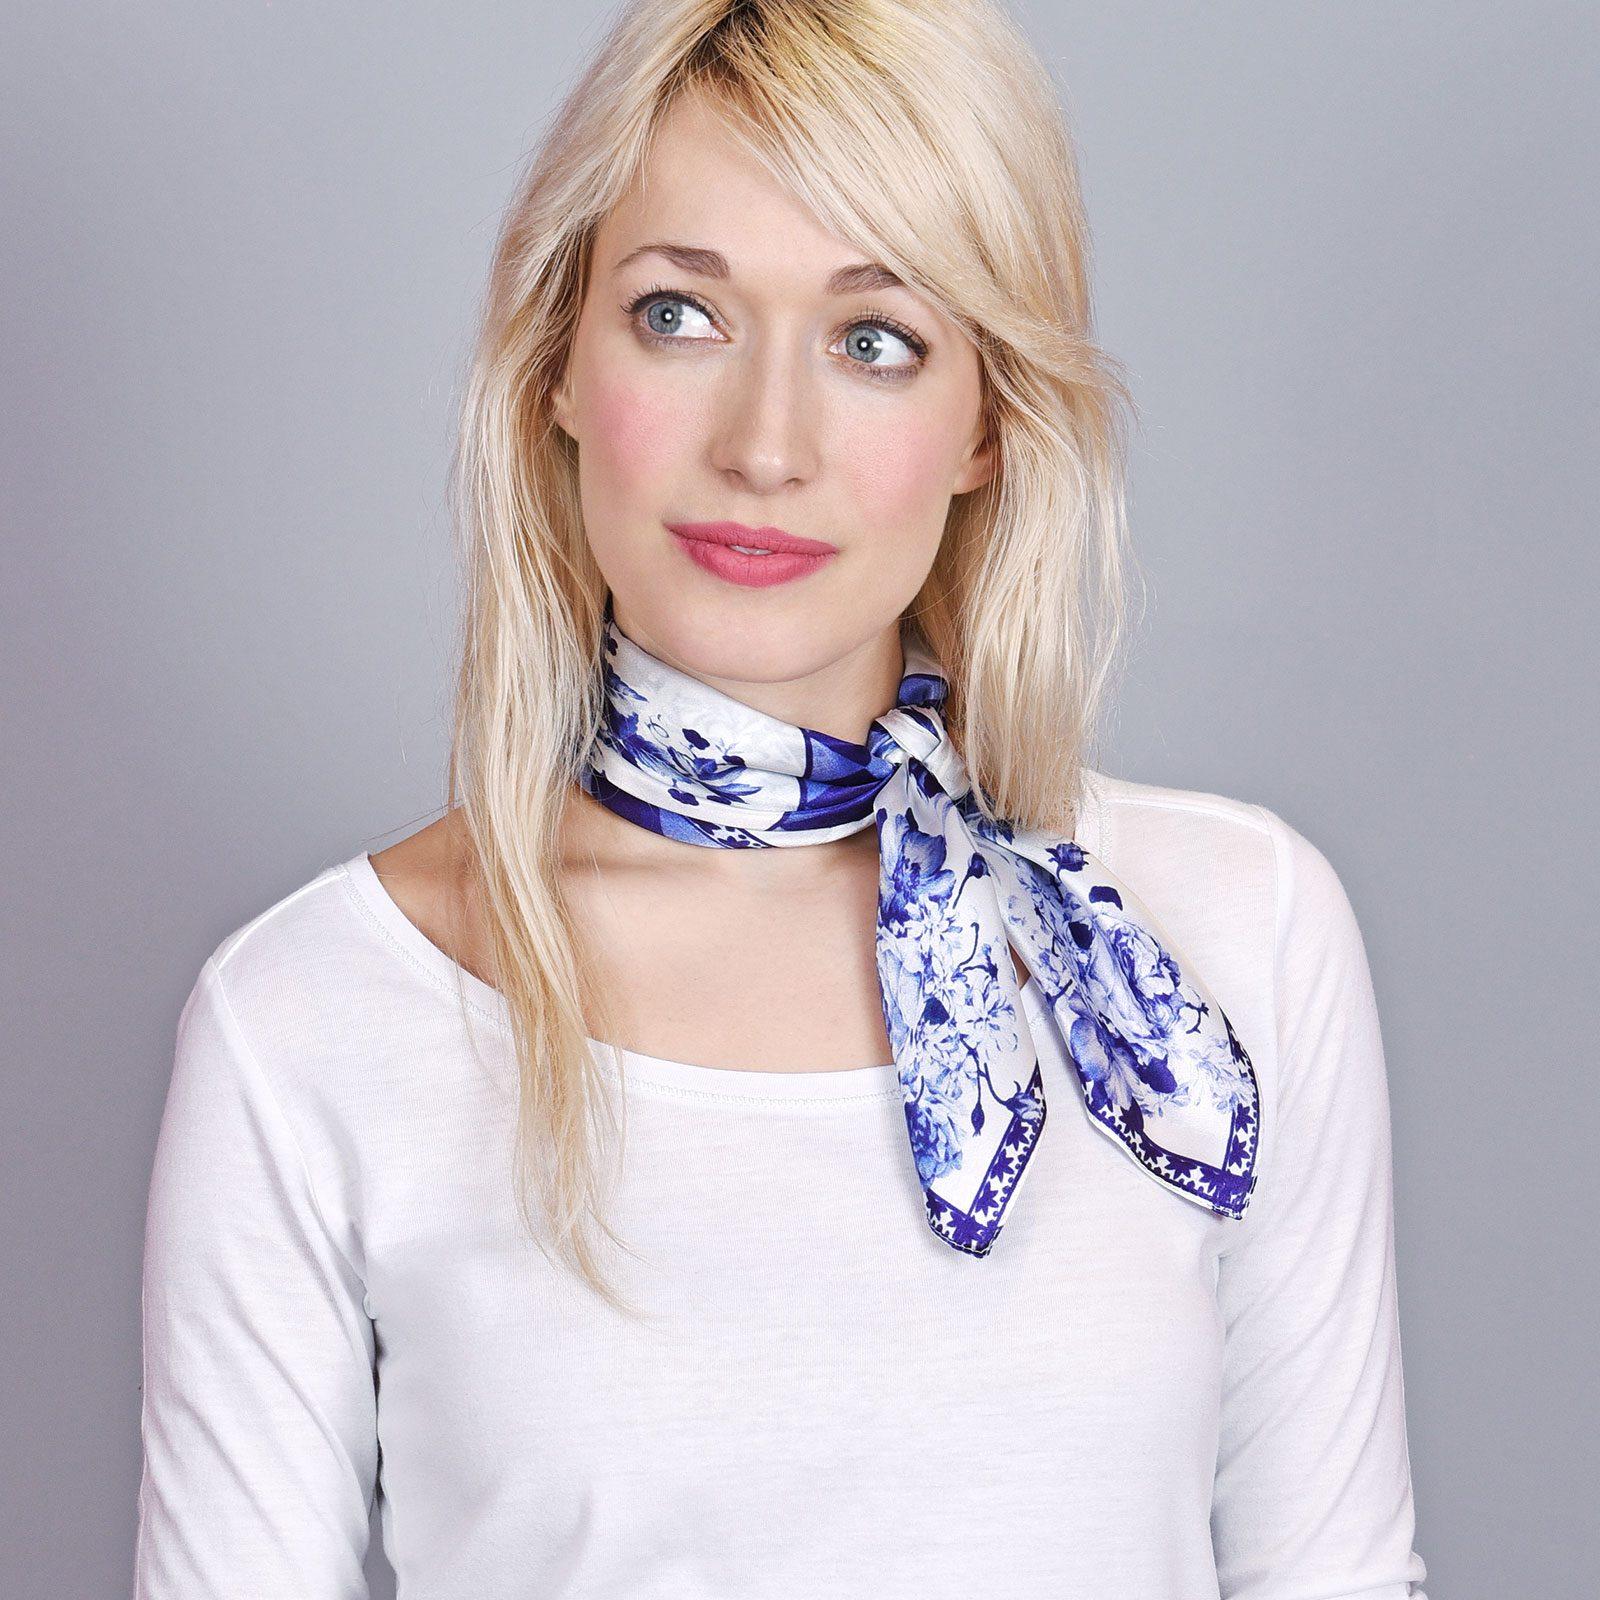 http://lookbook.allee-du-foulard.fr/wp-content/uploads/2018/09/AT-04435-VF16-foulard-carre-soie-roses-indigo-1600x1600.jpg